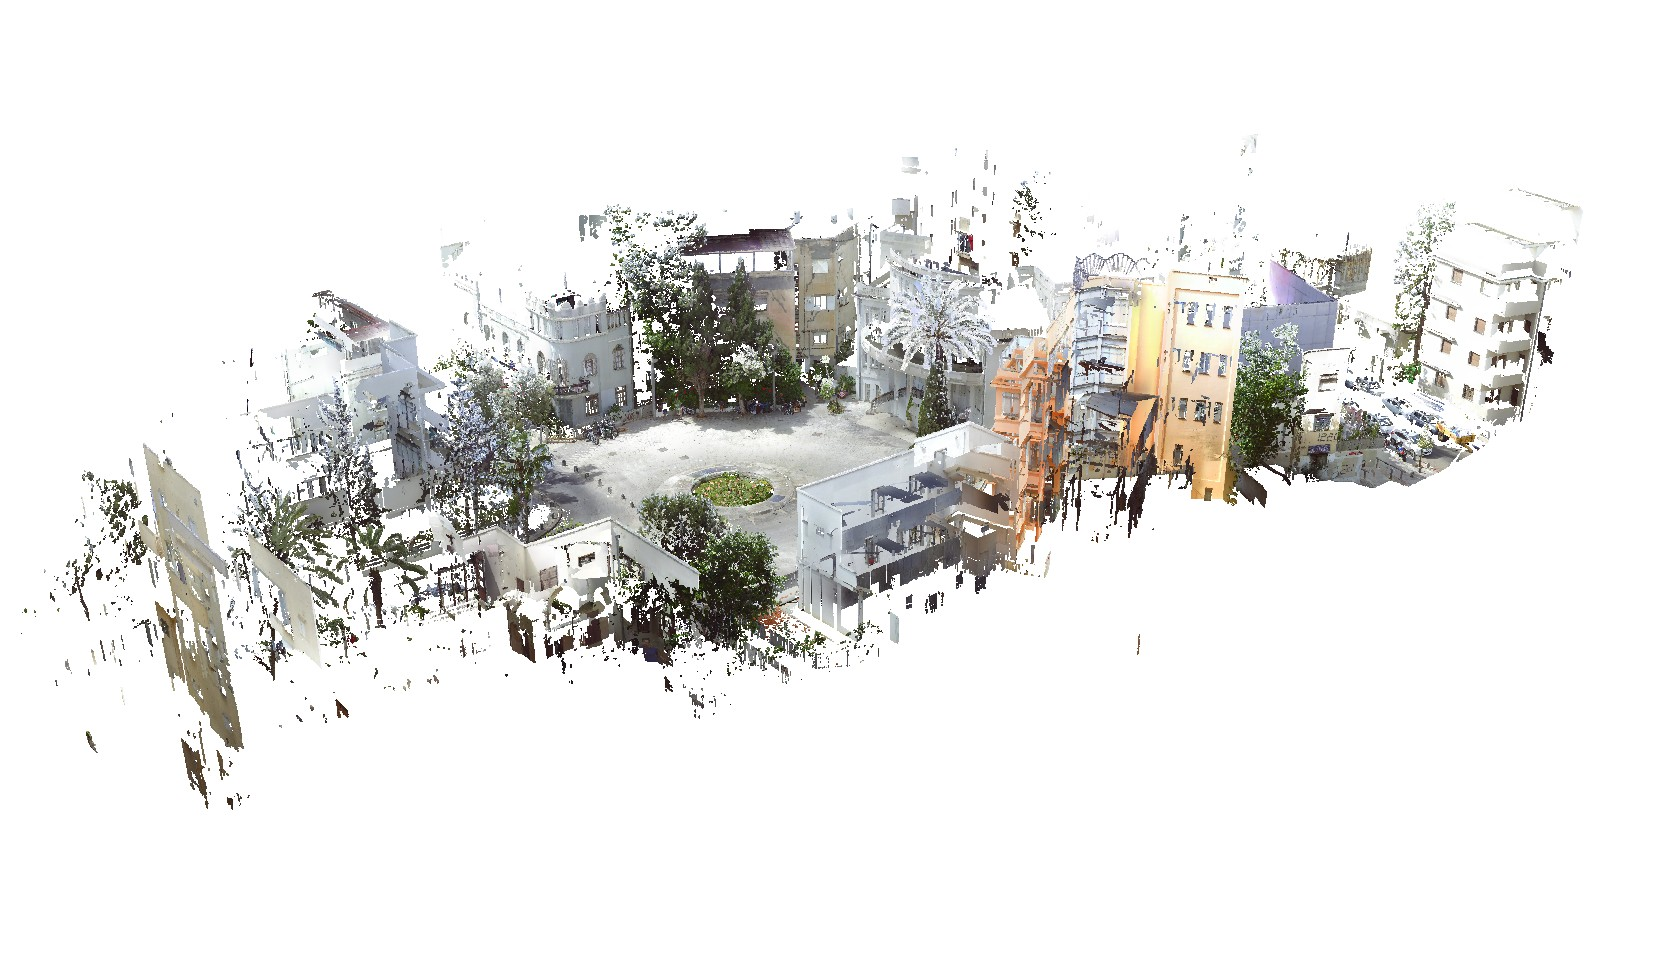 כיכר ביאליק סריקה